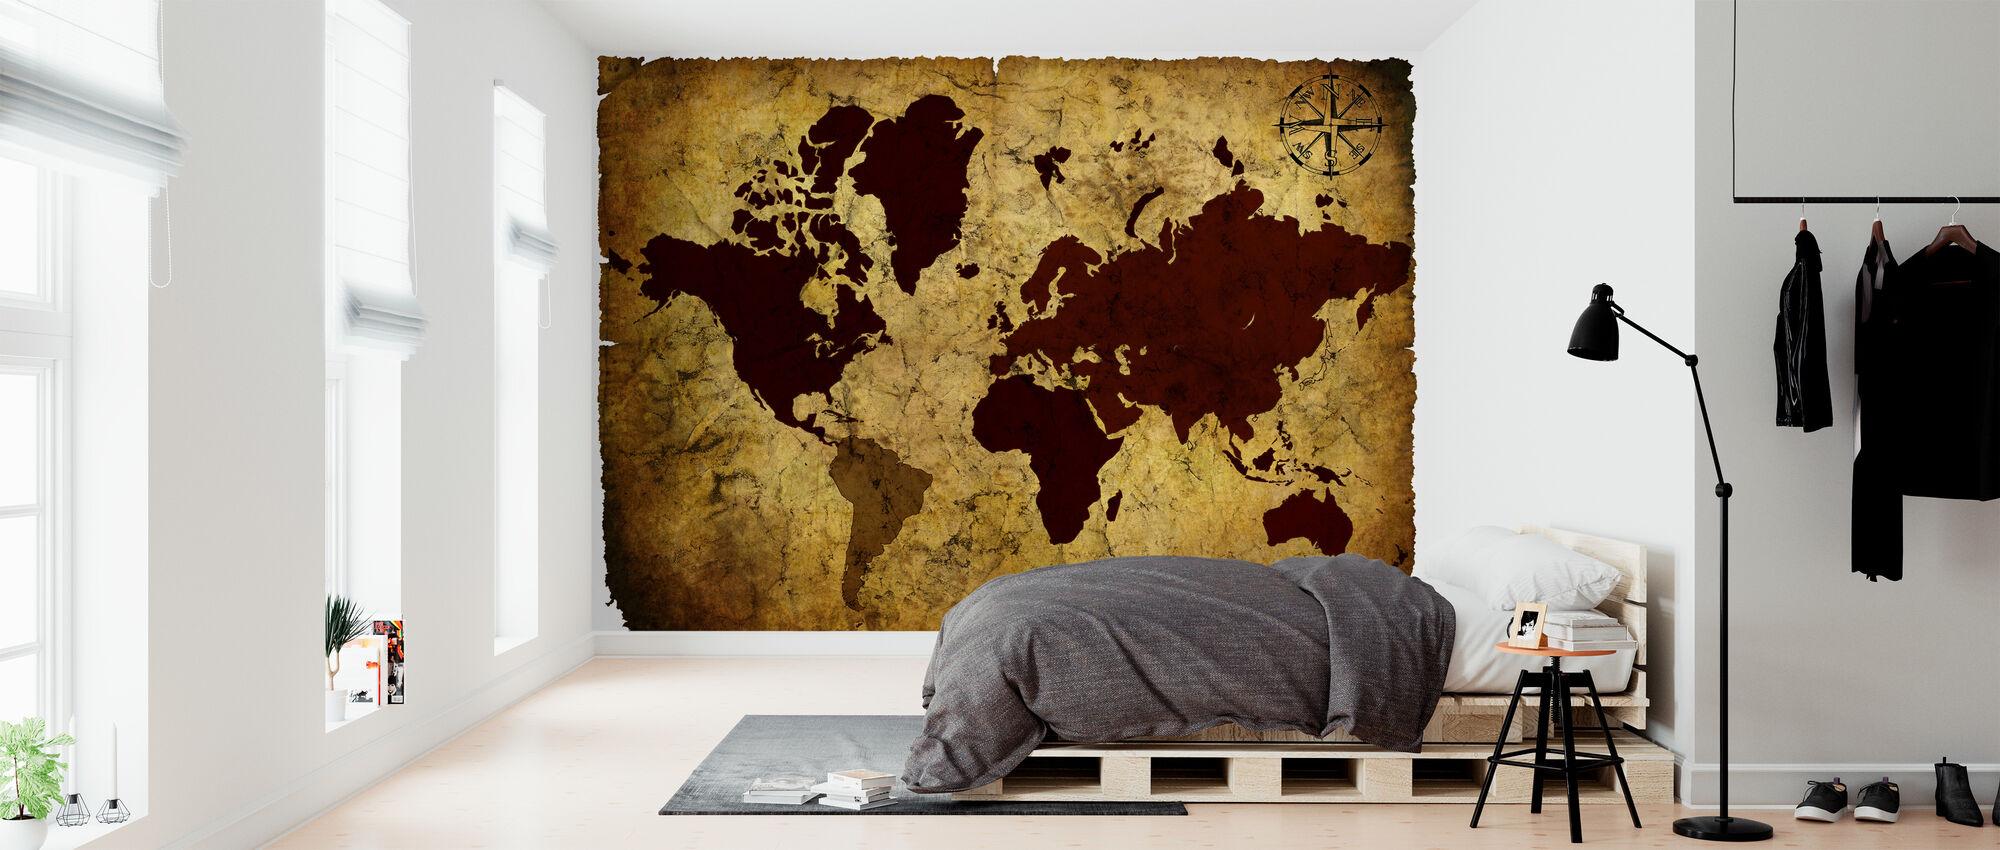 Old Manuscript of World Map - Wallpaper - Bedroom